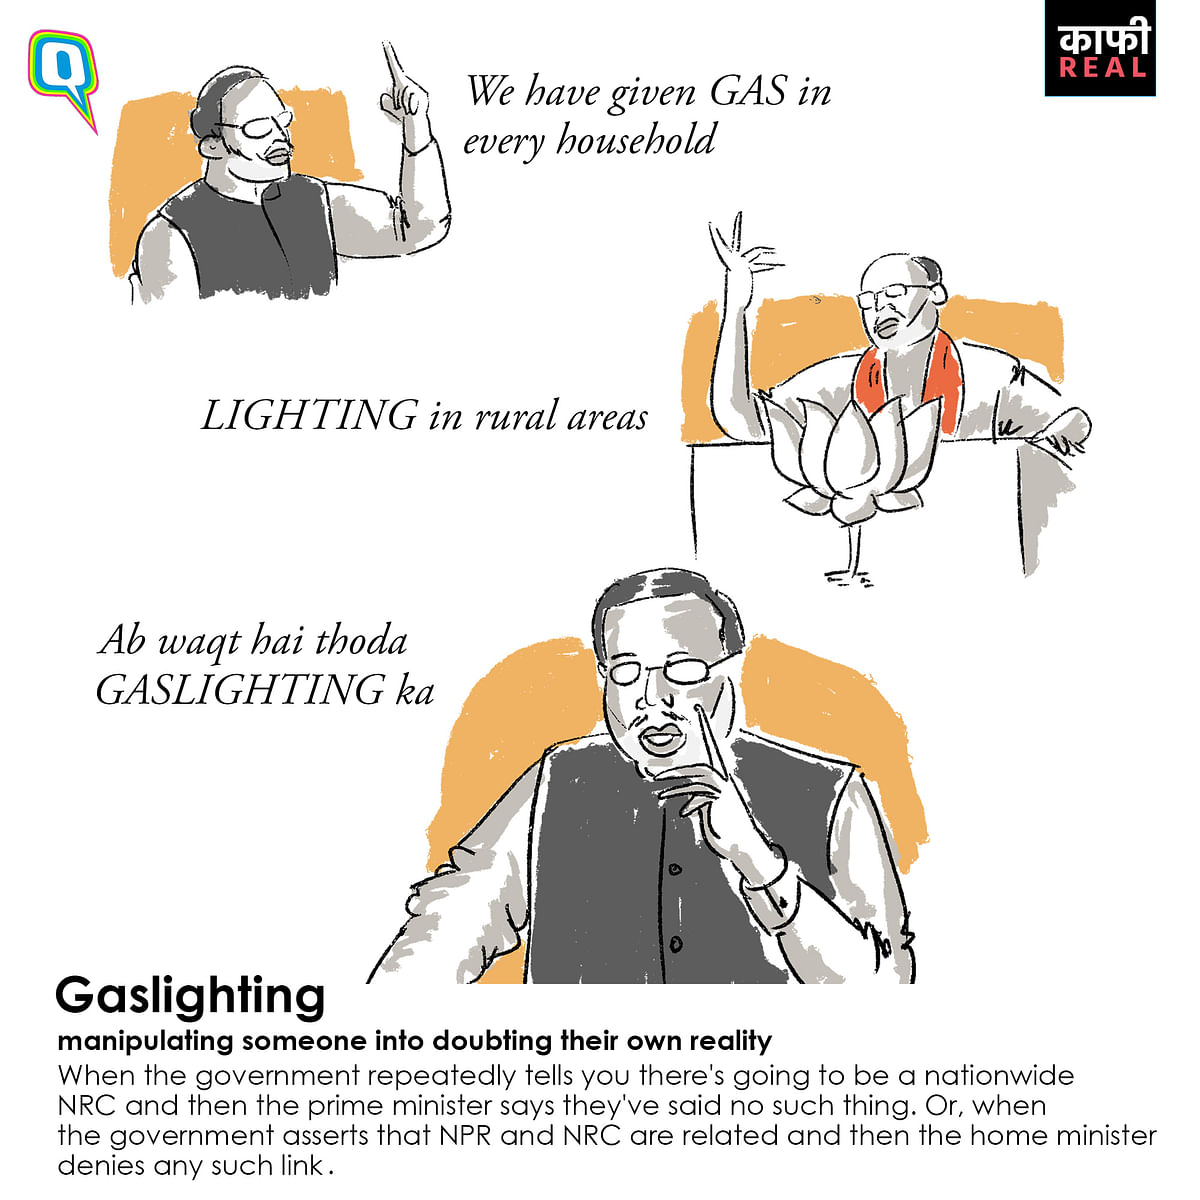 <i>Ab waqt hai thoda </i>gaslighting<i> ka.</i>